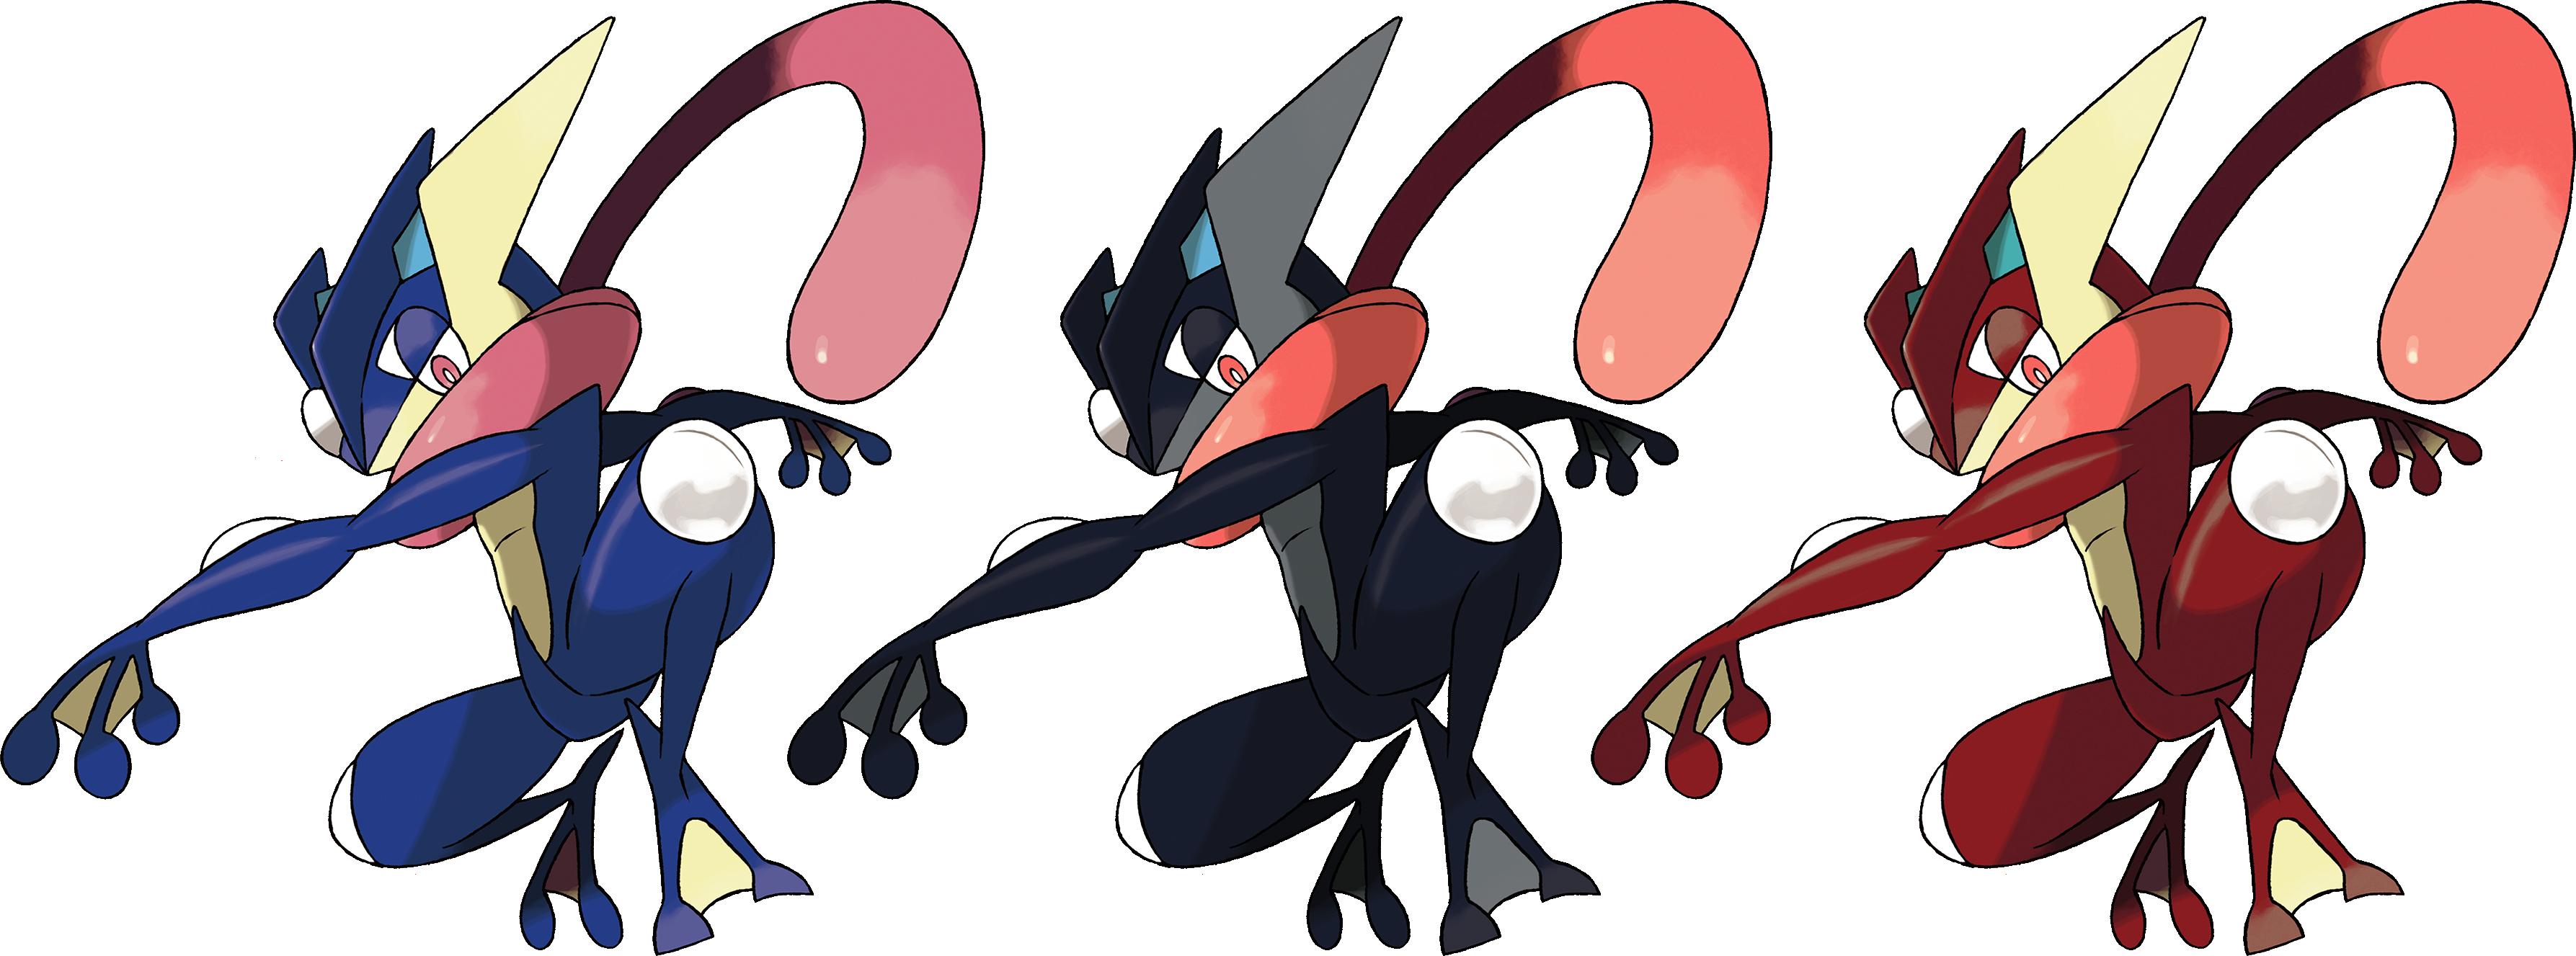 greninja shiny pokemon mega evolution deviantart krocf4 fan sonic anime characters pre